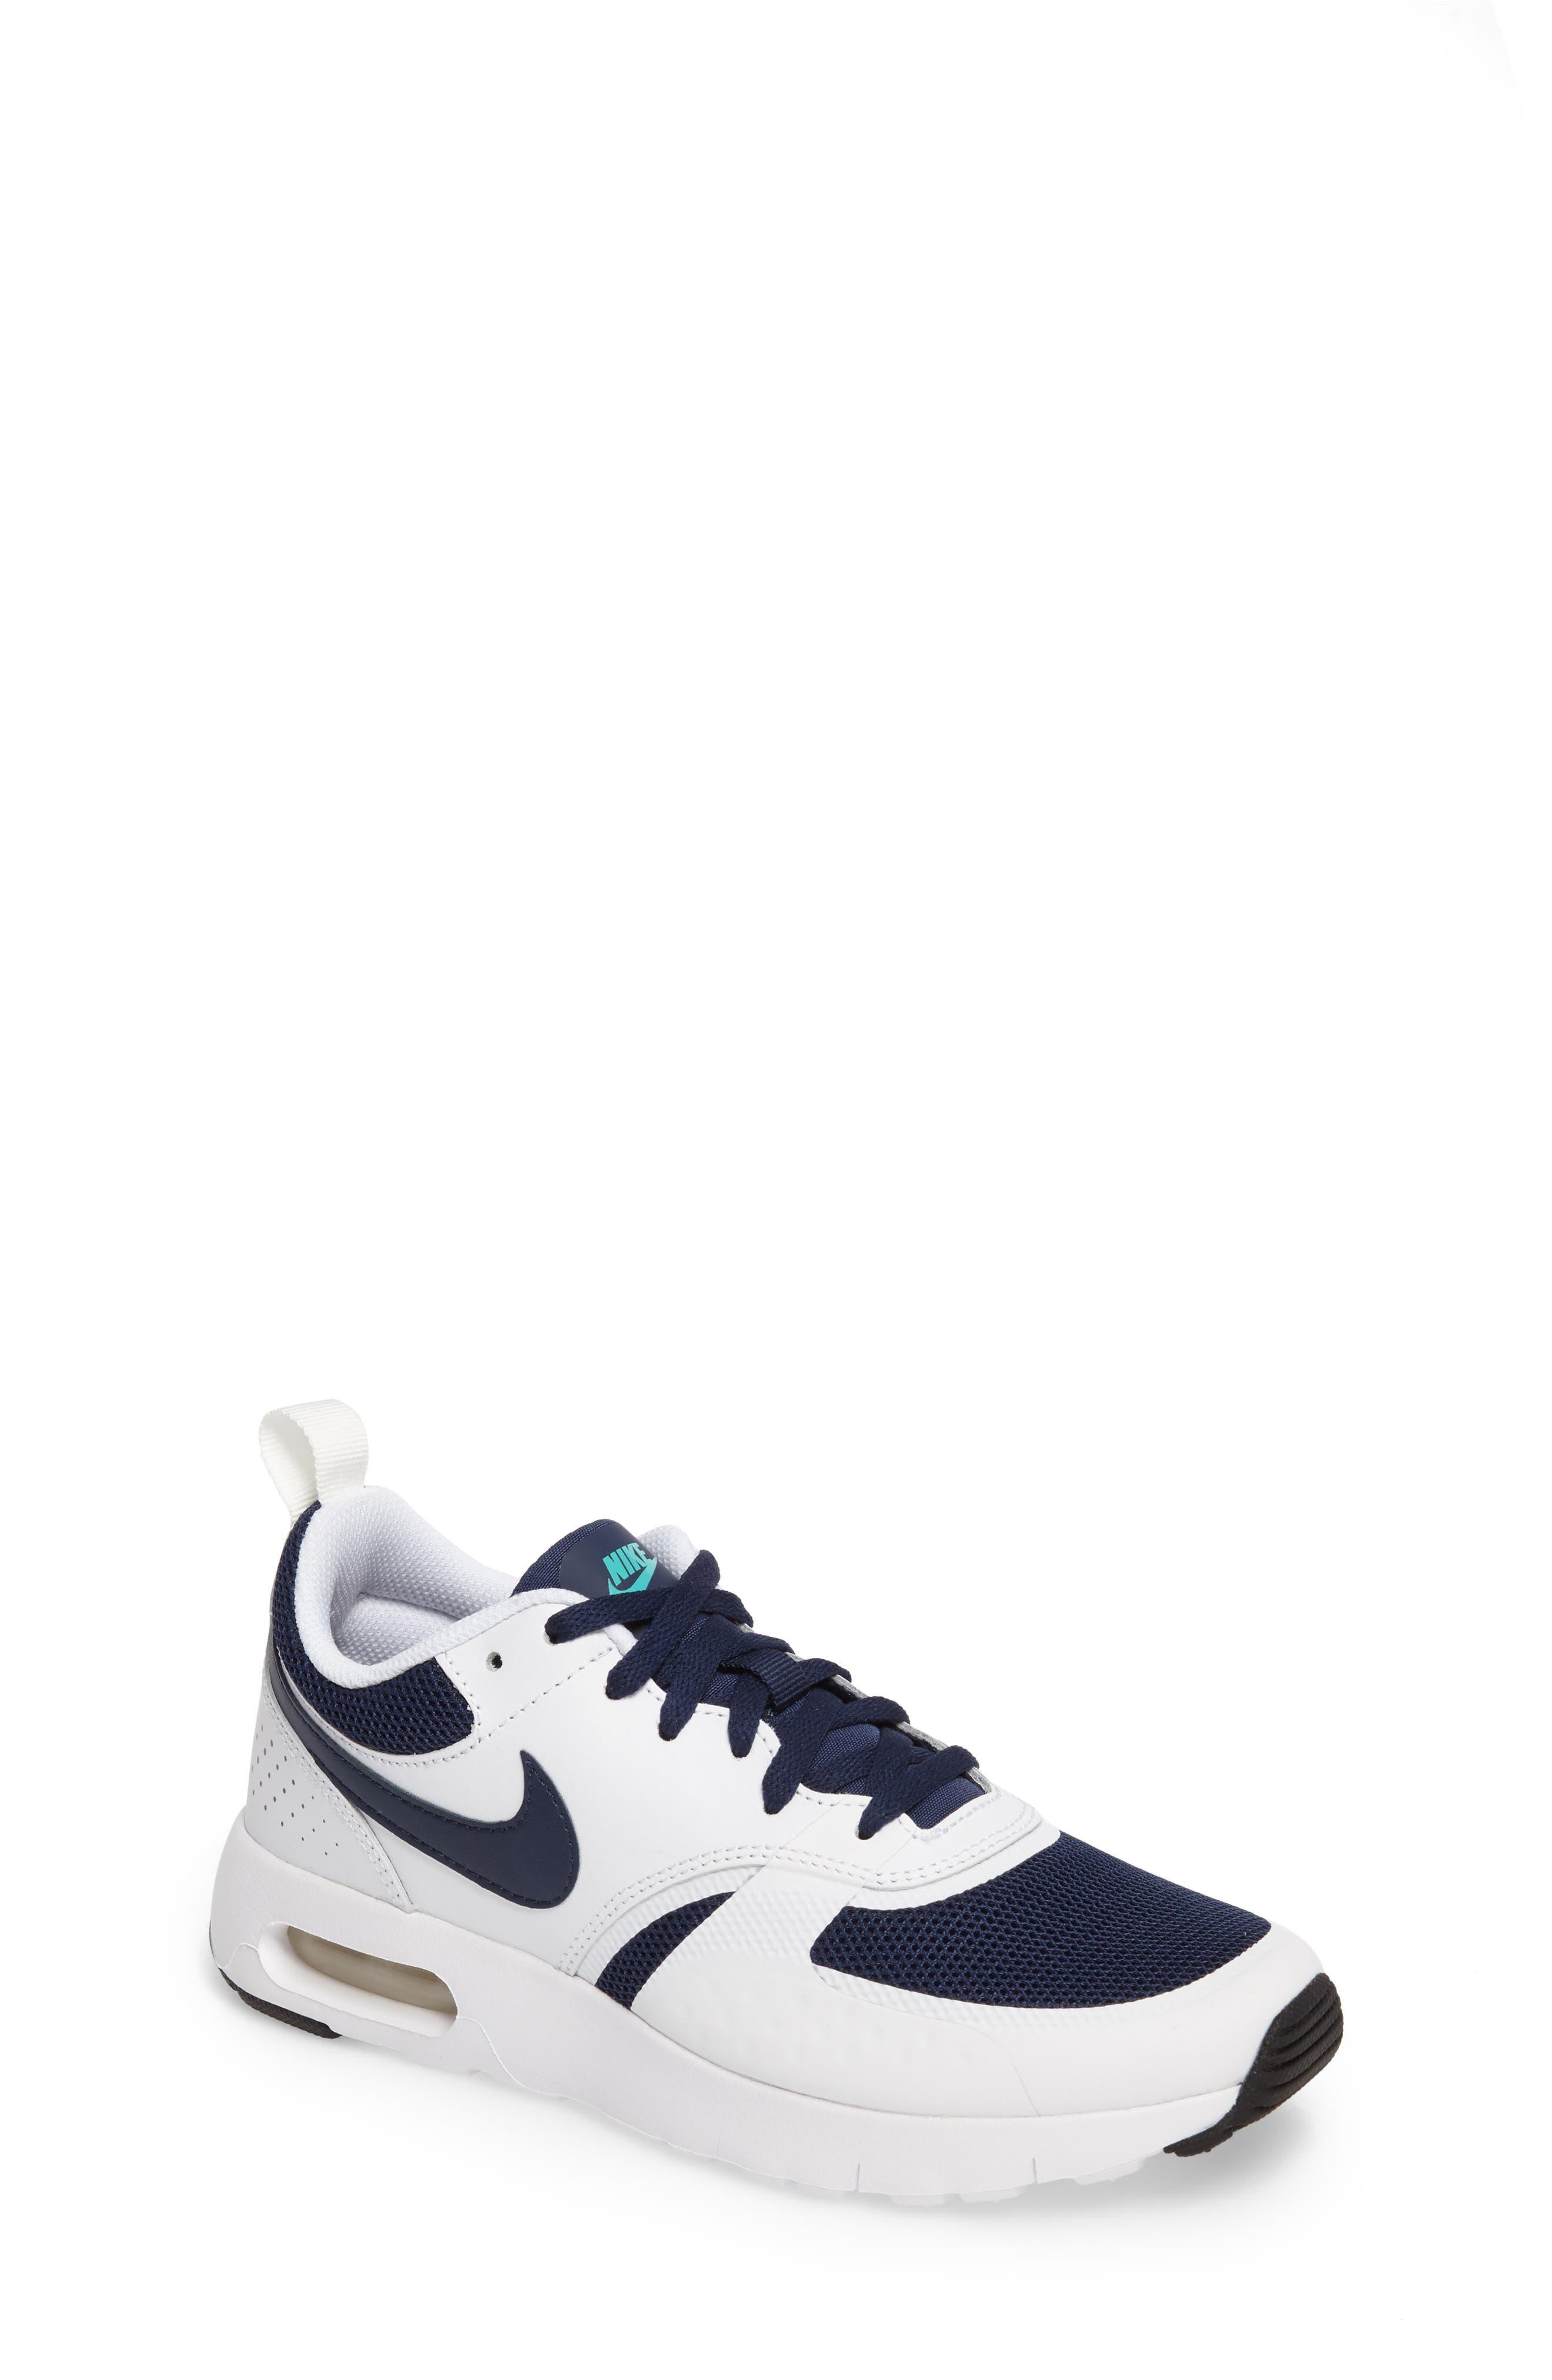 NIKE Air Max Vision GS Sneaker